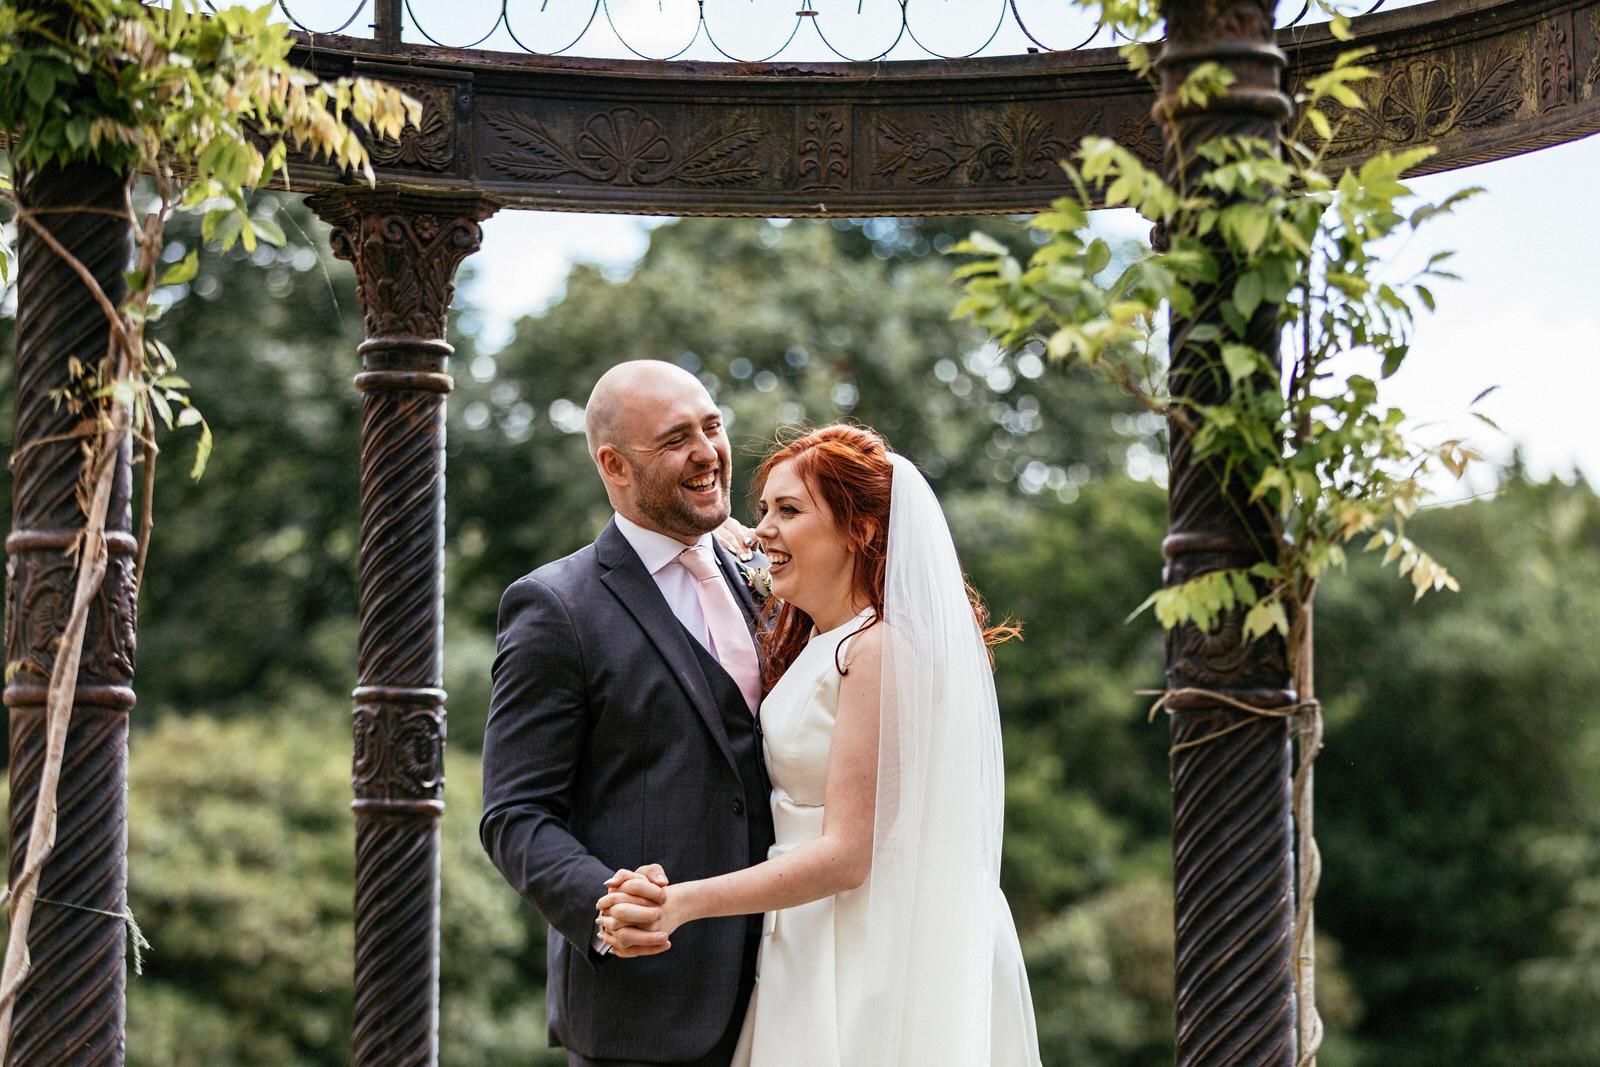 Beamish-Hall-Wedding-Photographer-050.jpg